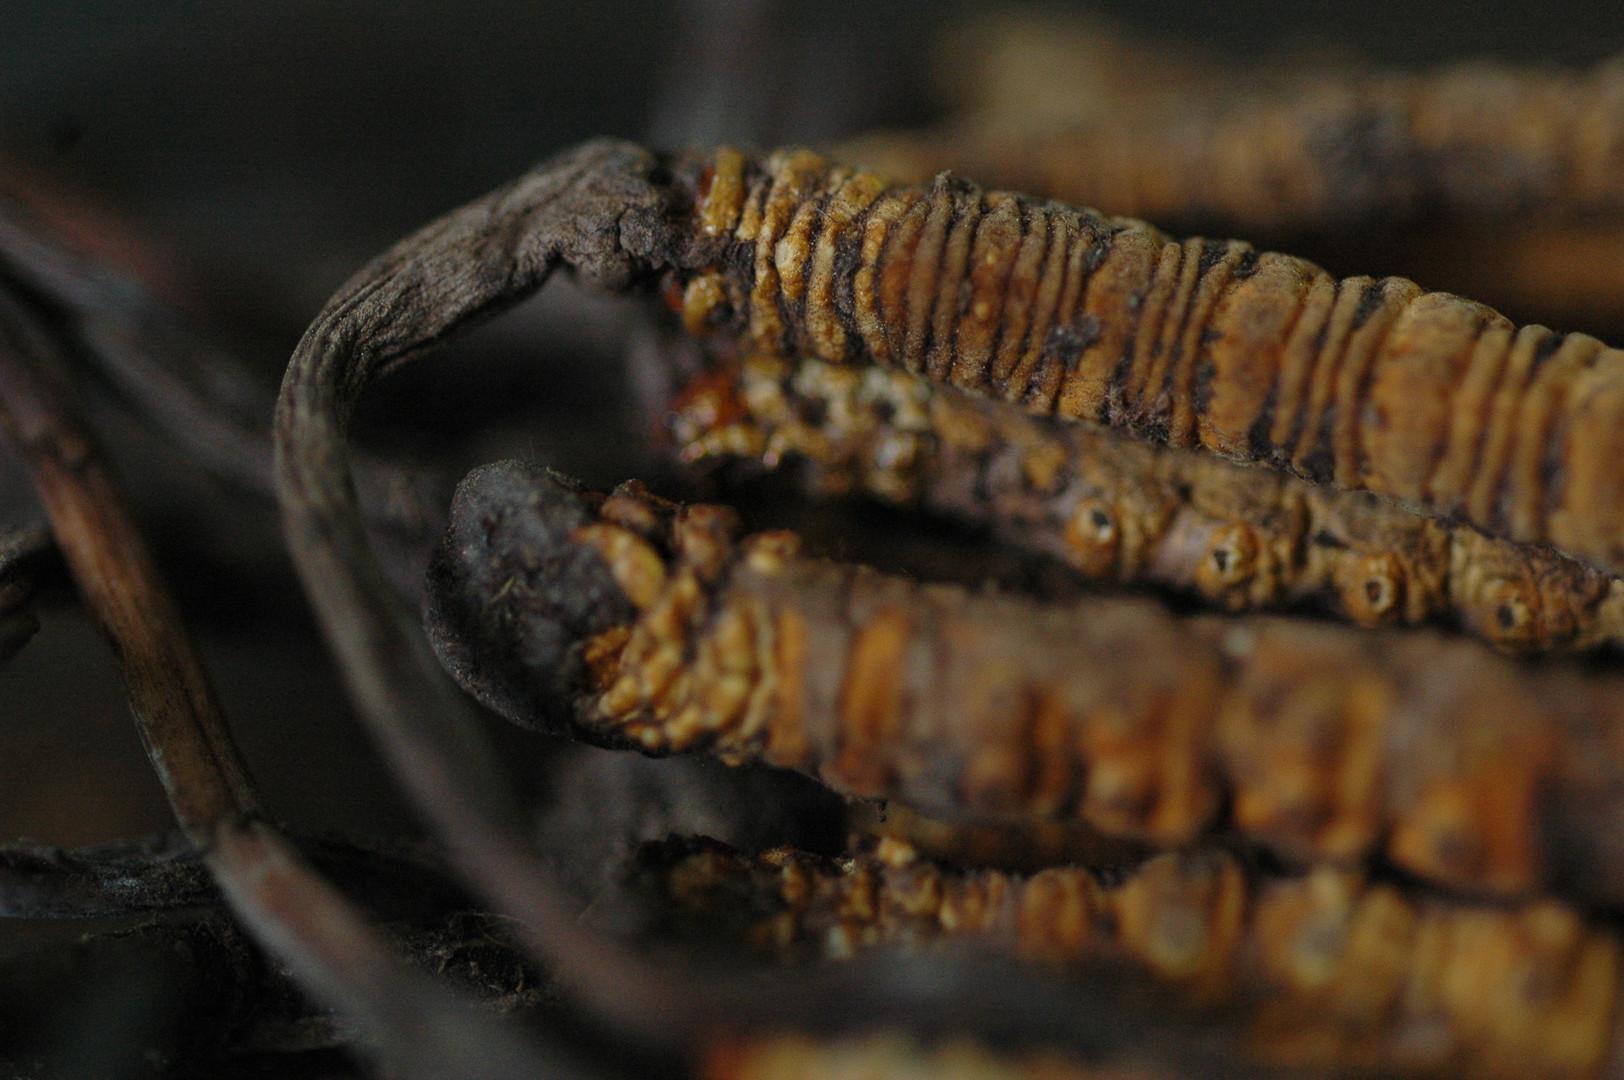 The 'Worm' (Caterpillar Fungus) - Tibet